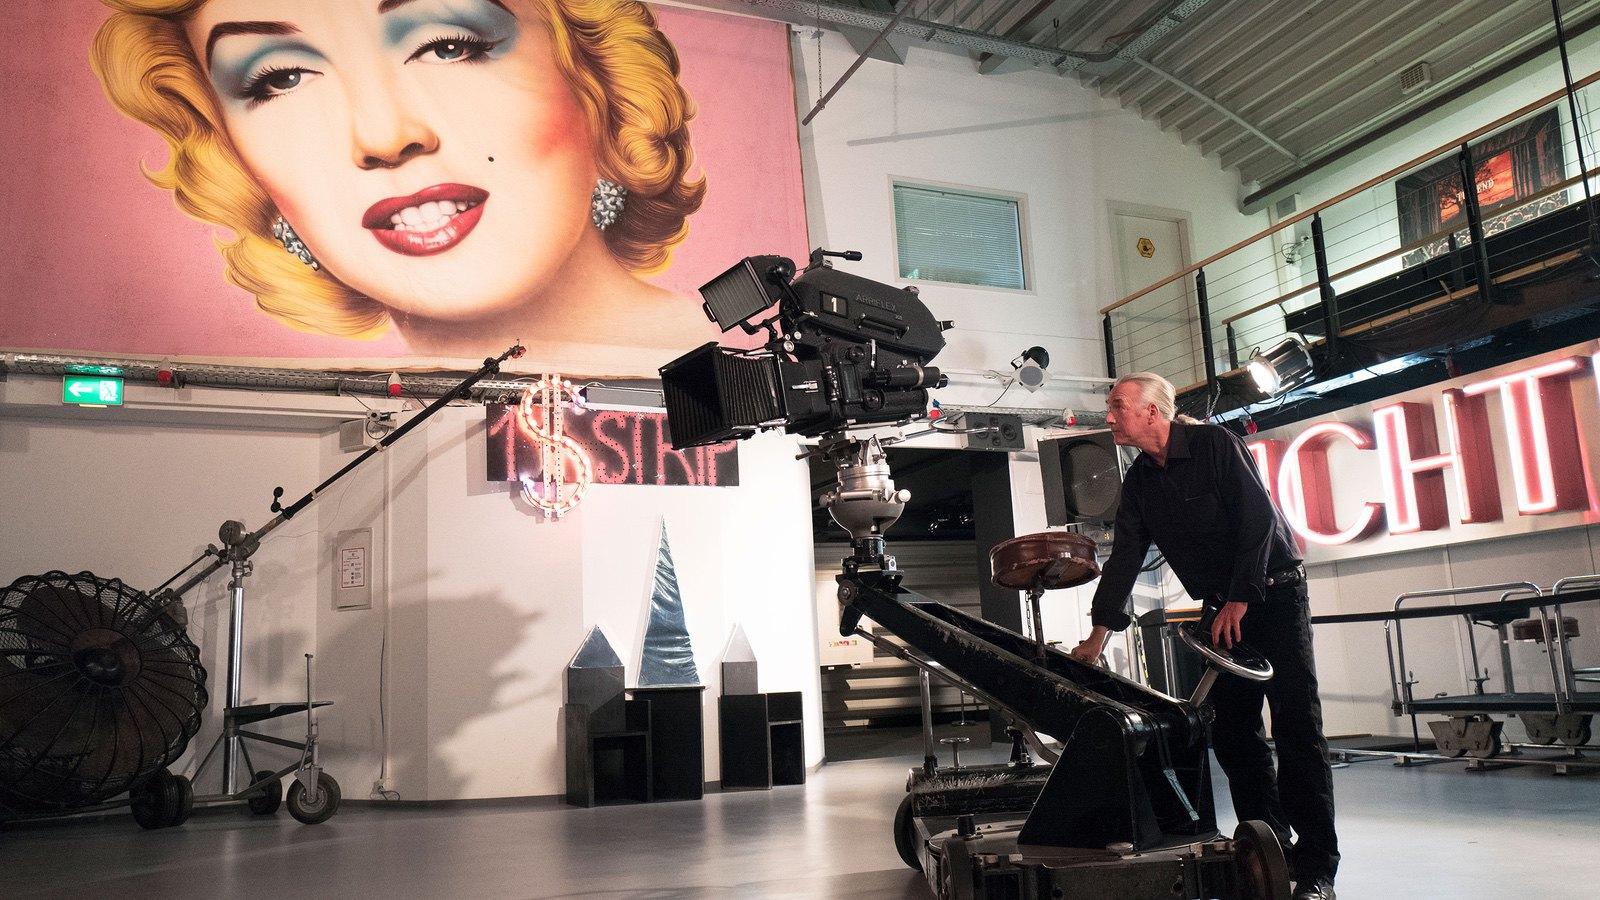 Sieht Modernisierungsbedarf: Bernd Desinger, Direktor des Filmmuseums Düsseldorf